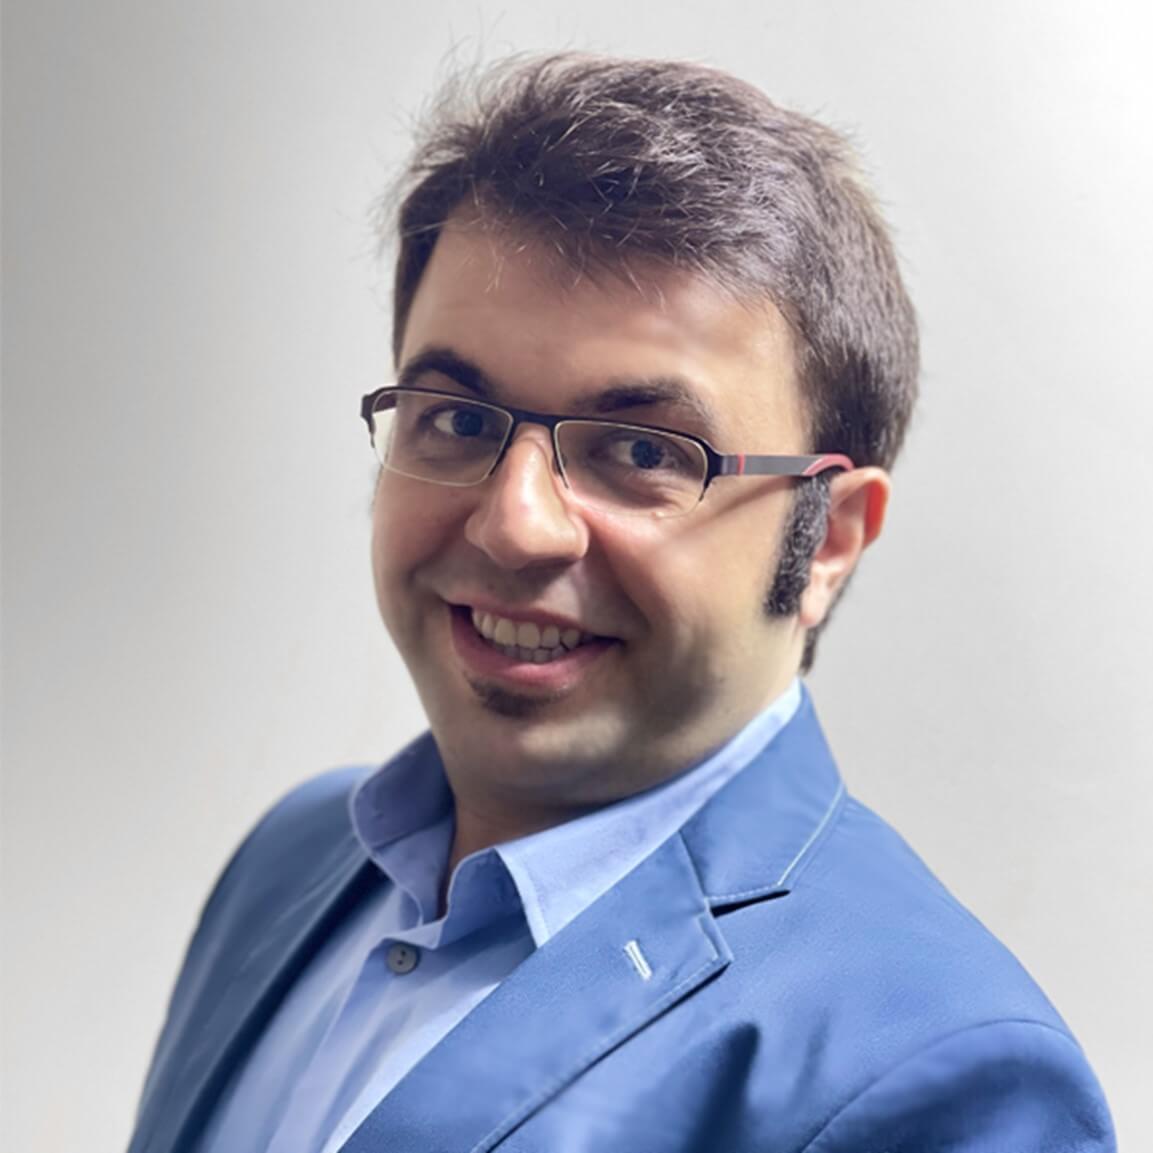 Soheil Ashkani-Esfahani, MD MODERATOR